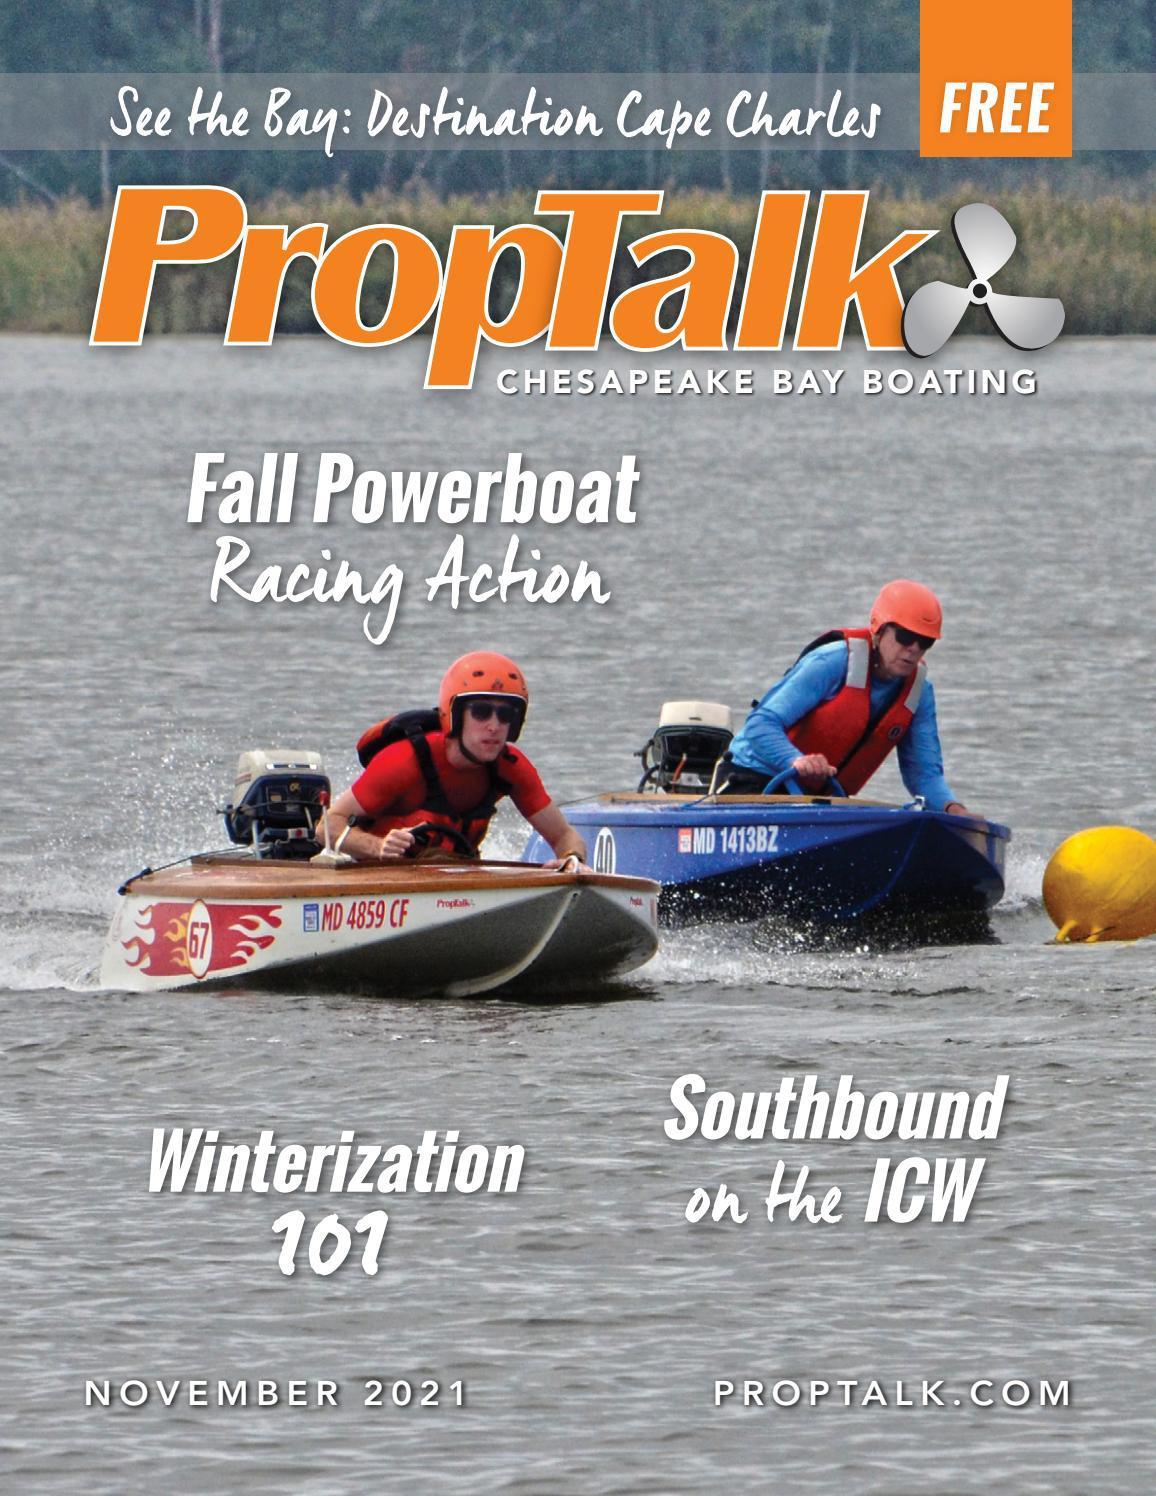 PropTalk Magazine November 2021